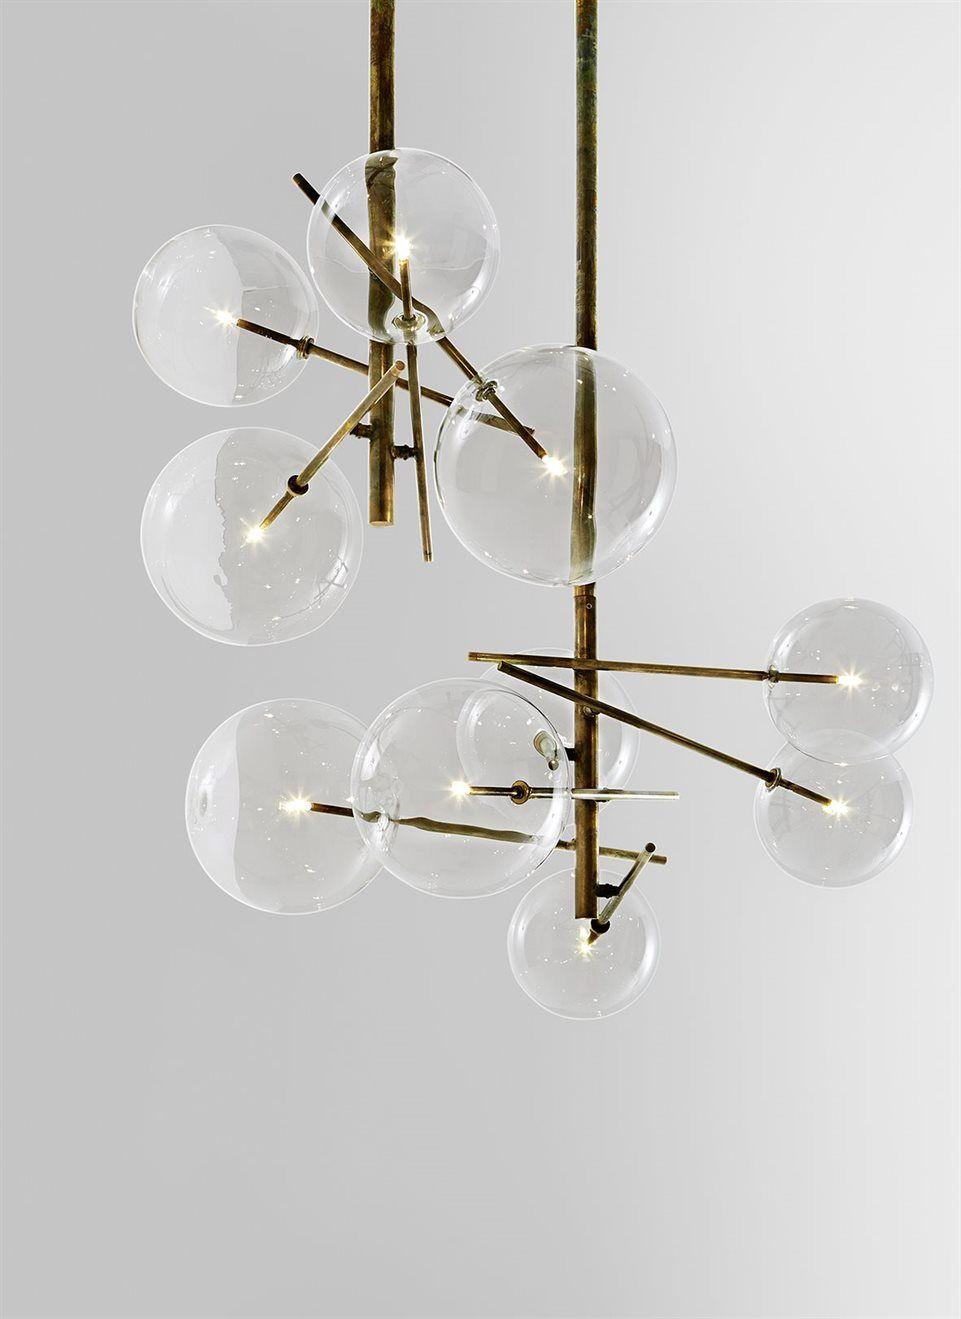 Bolle gallotti radice light design licht for Altbauwohnung design